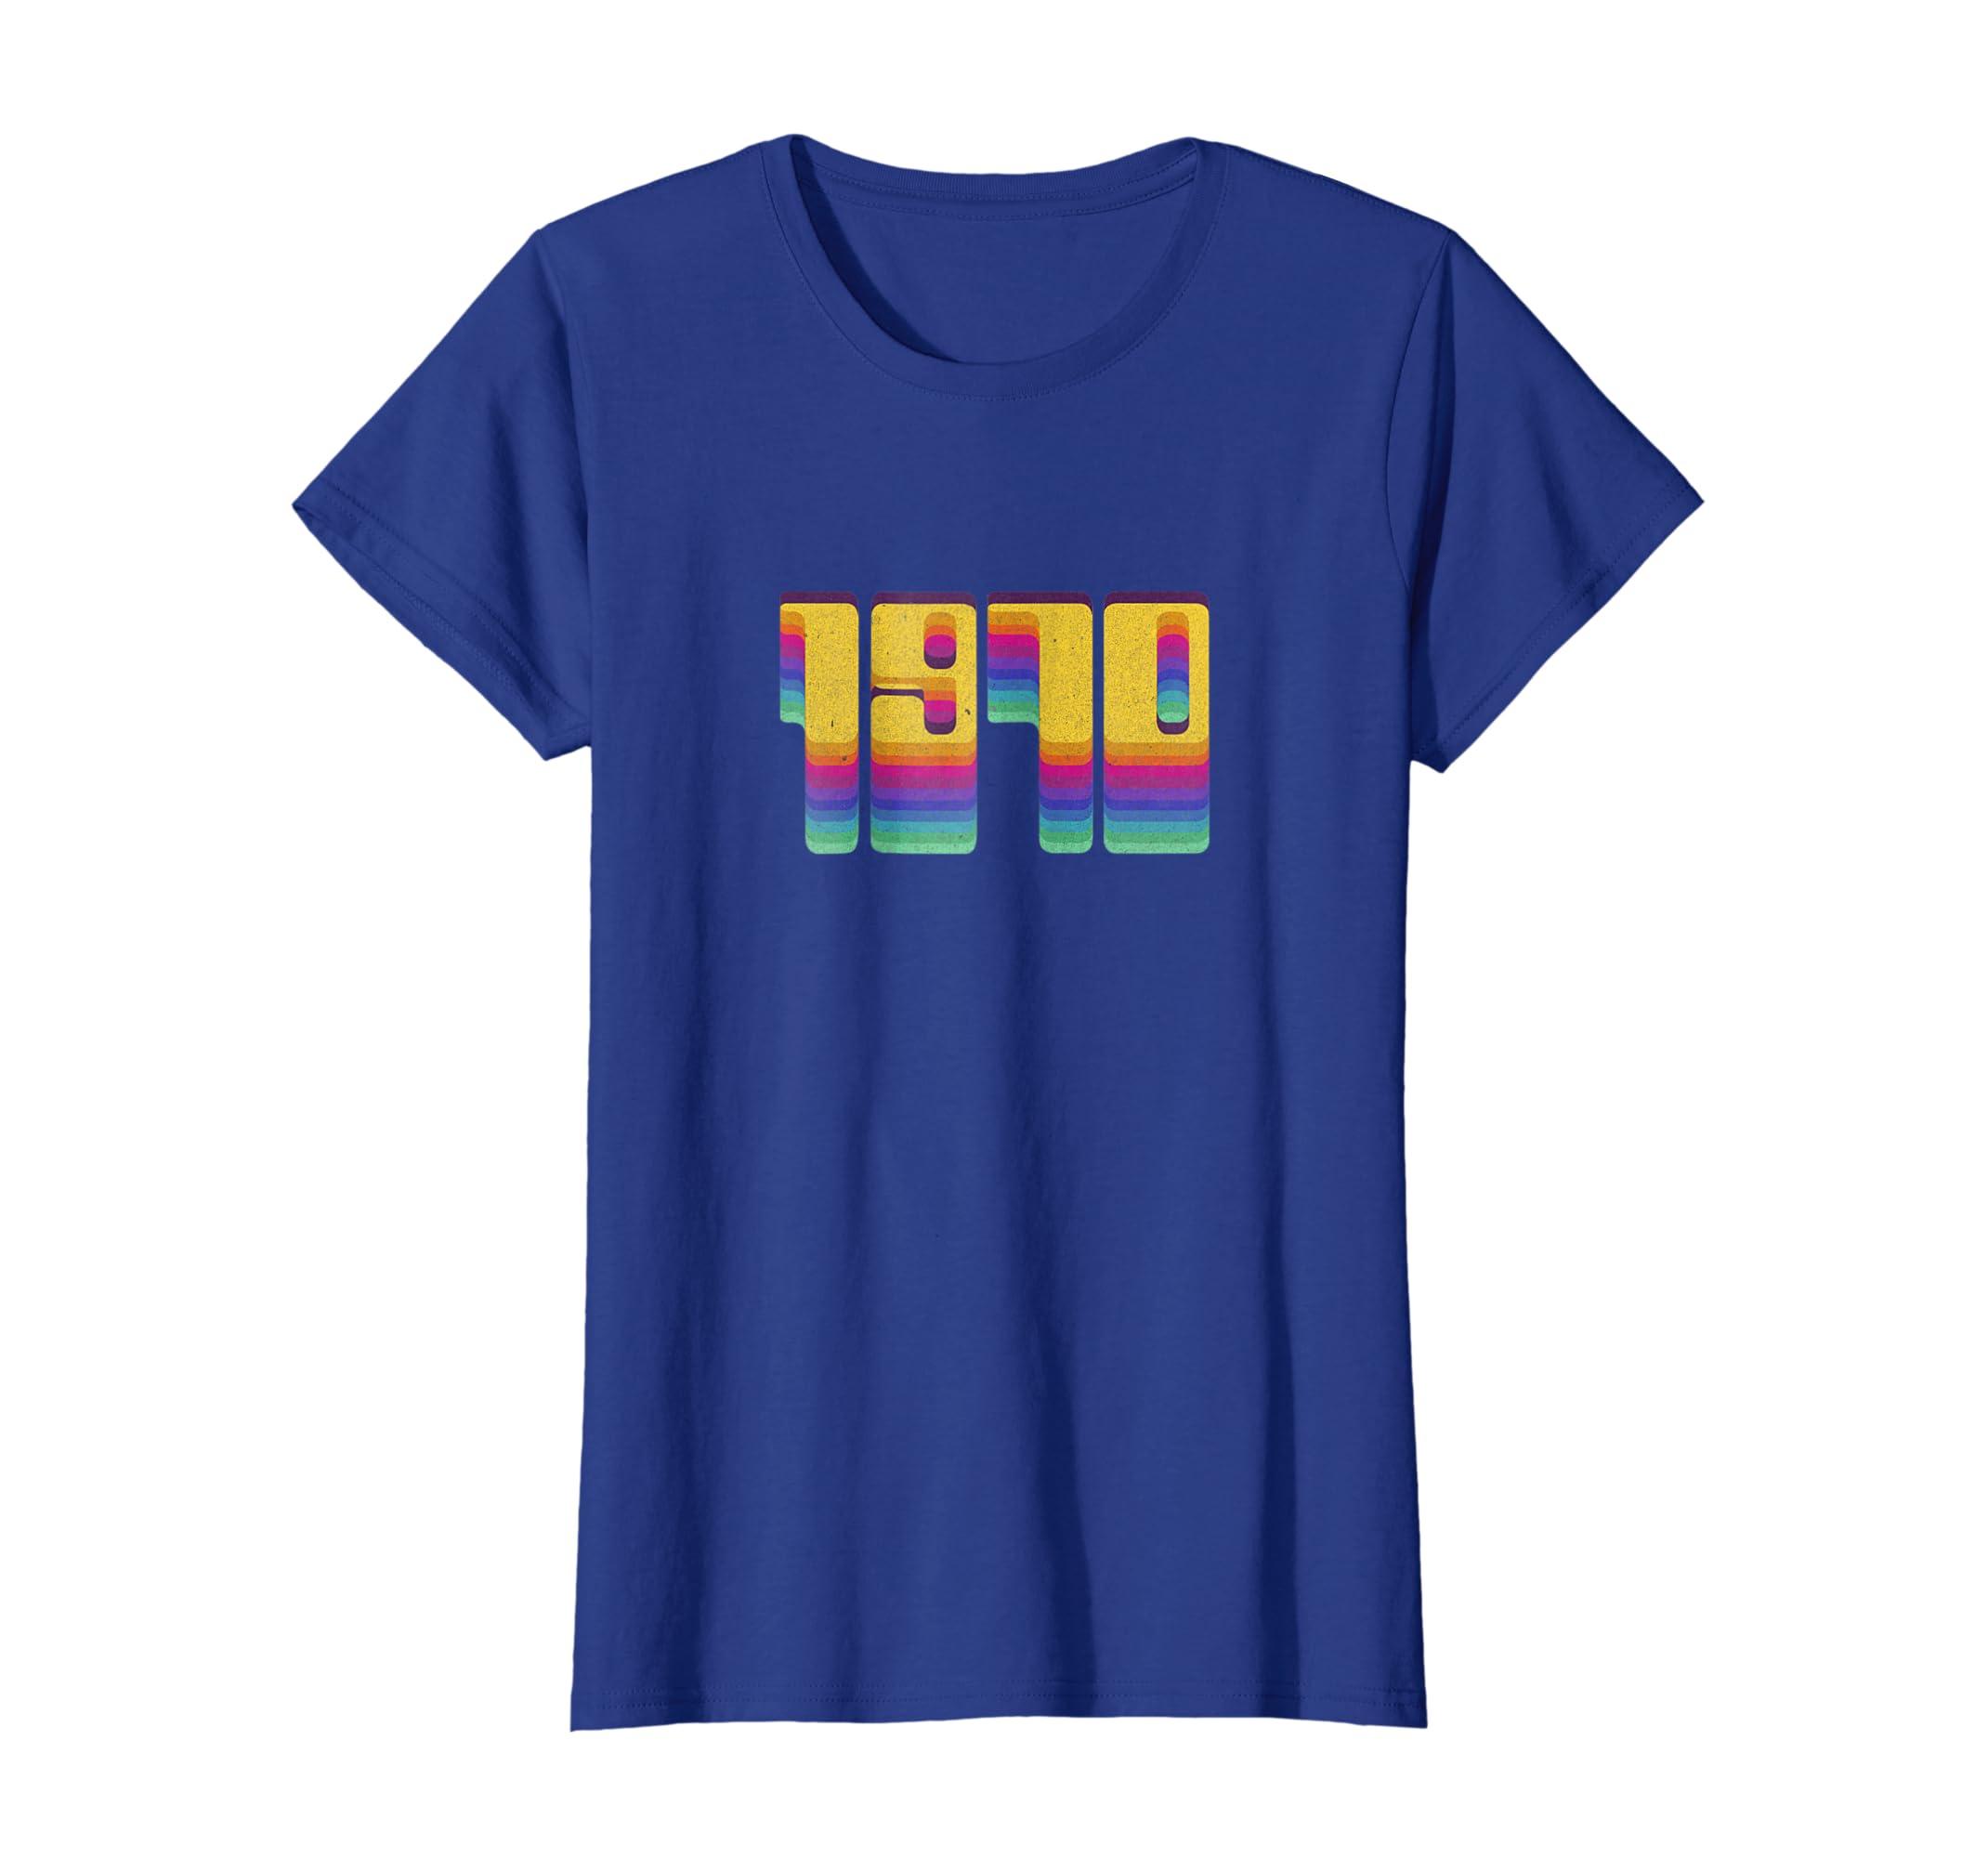 Amazon 1970 Slogan Seventies 70s T Shirt Cool Vintage Retro Style Clothing